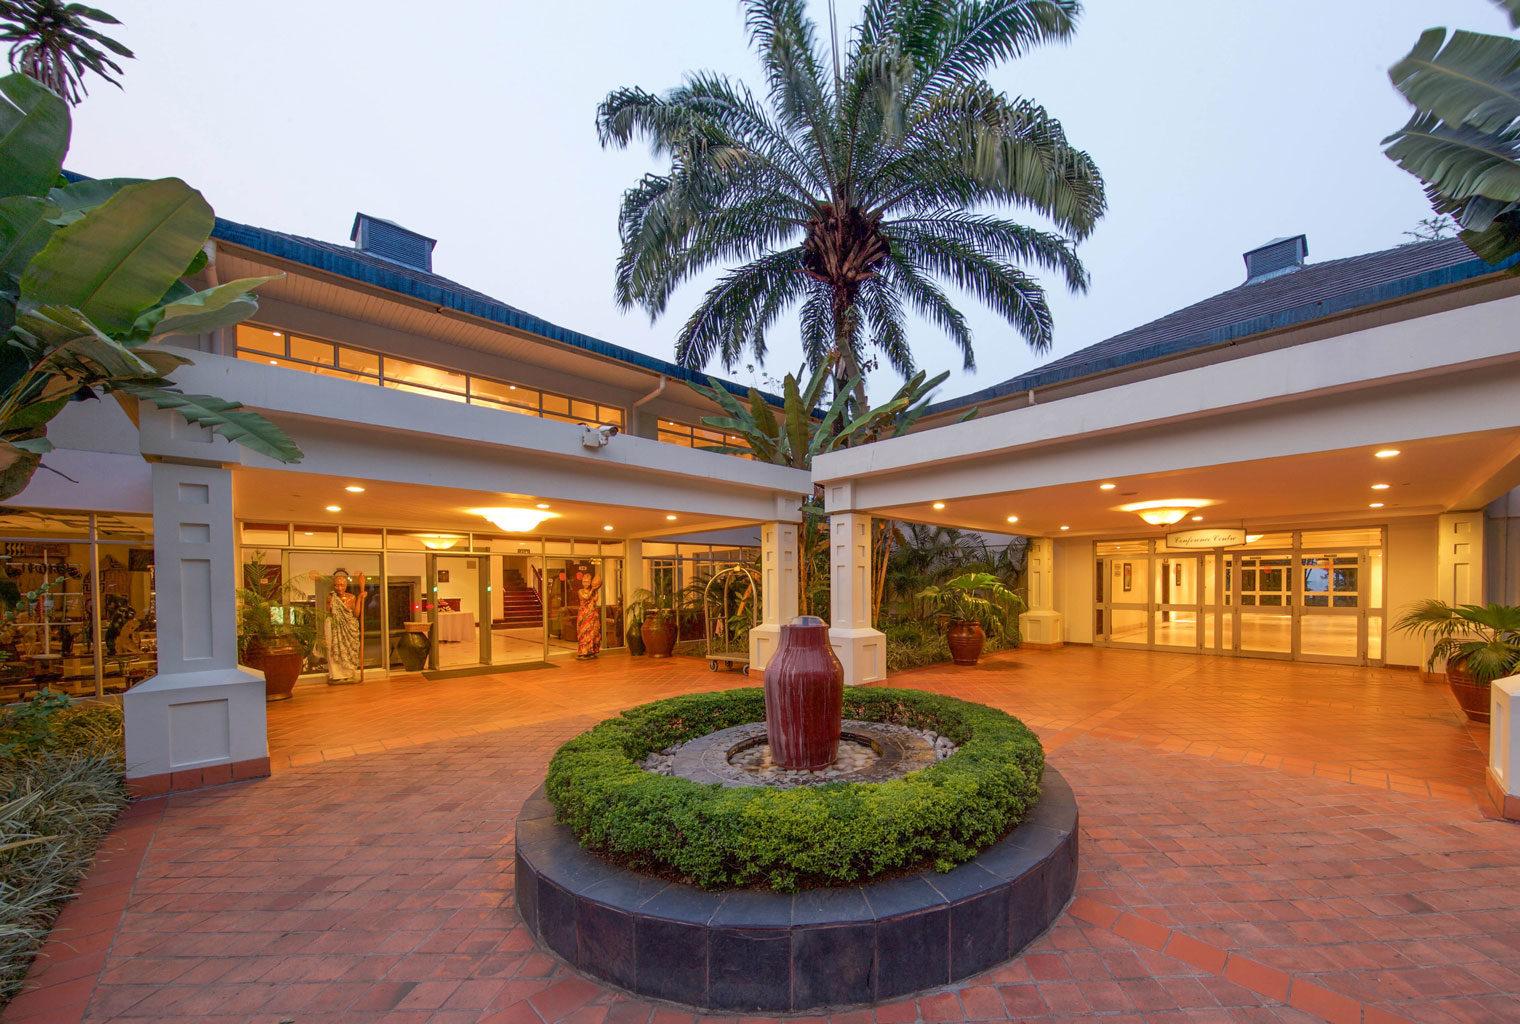 Hotel-Entrance-Lake-Kivu-Serena-Rwanda